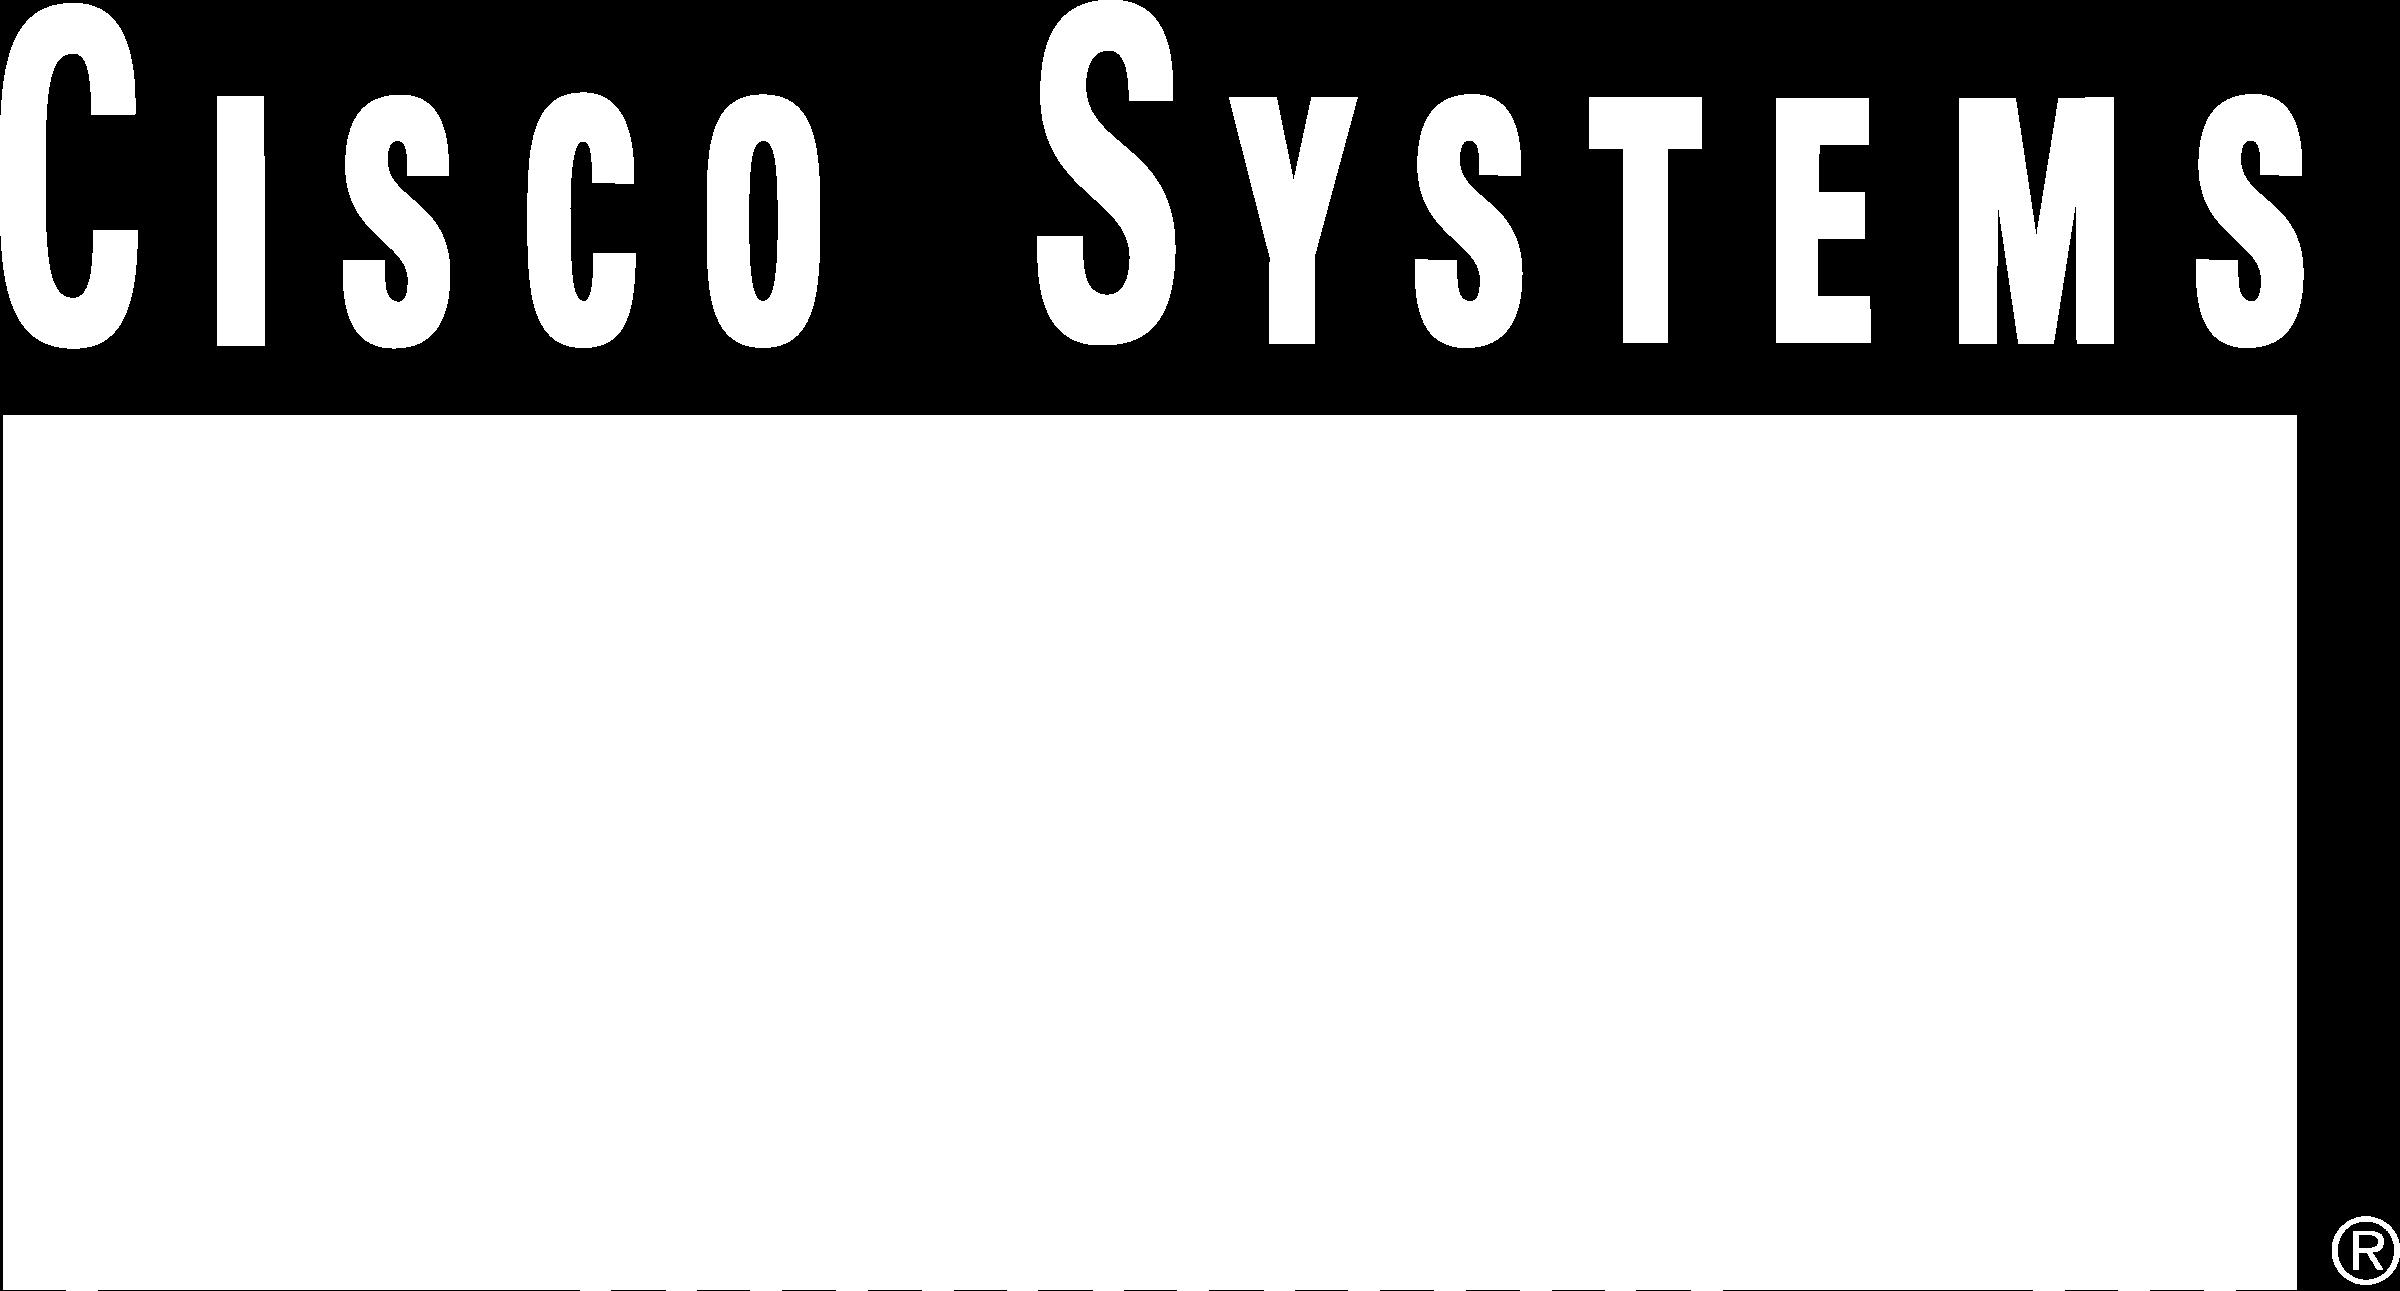 CISCO SYSTEMS 1 Logo PNG Transparent & SVG Vector.